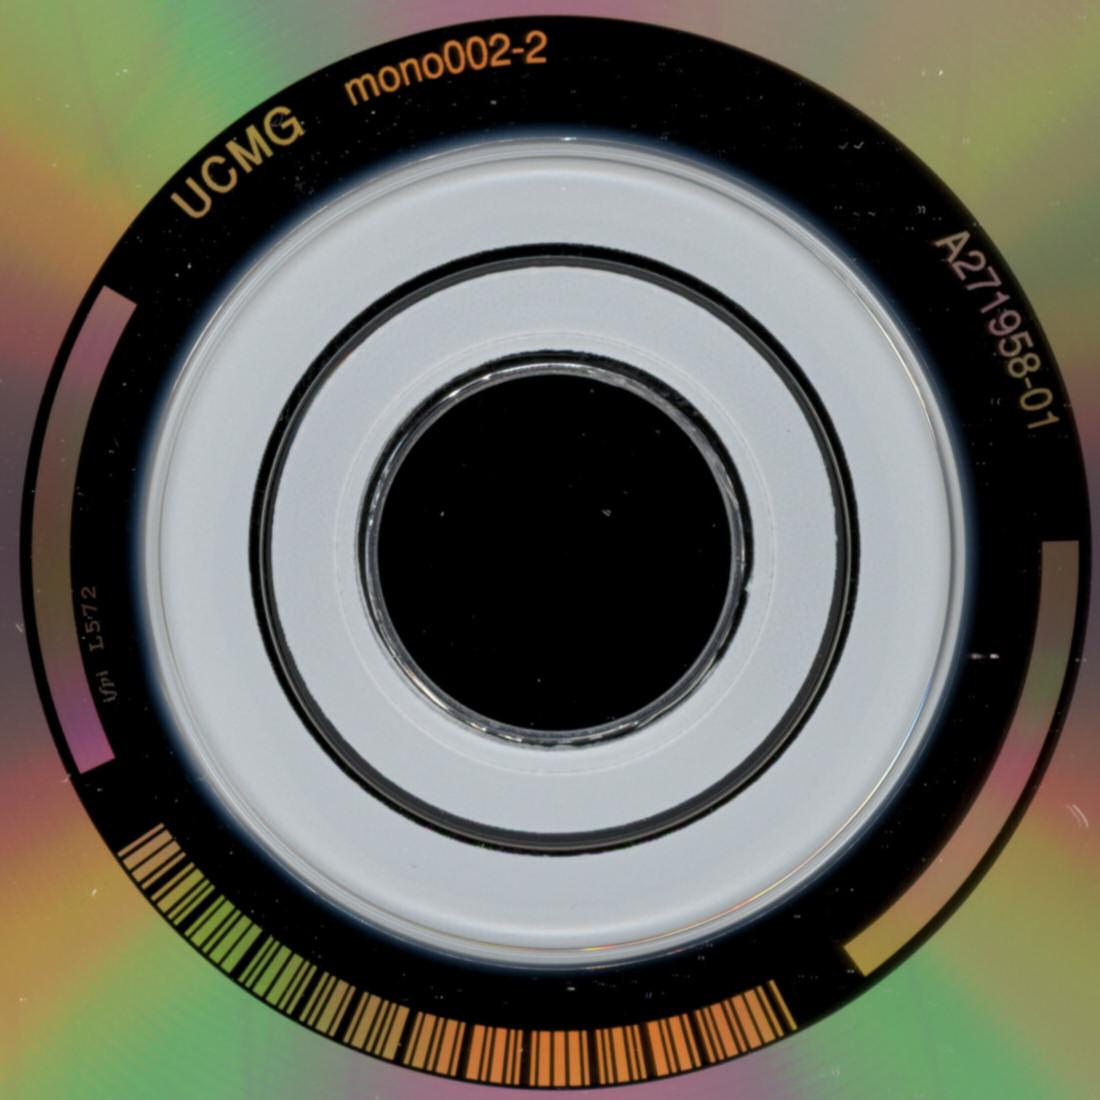 Michael Burkat - Dark Entries EP